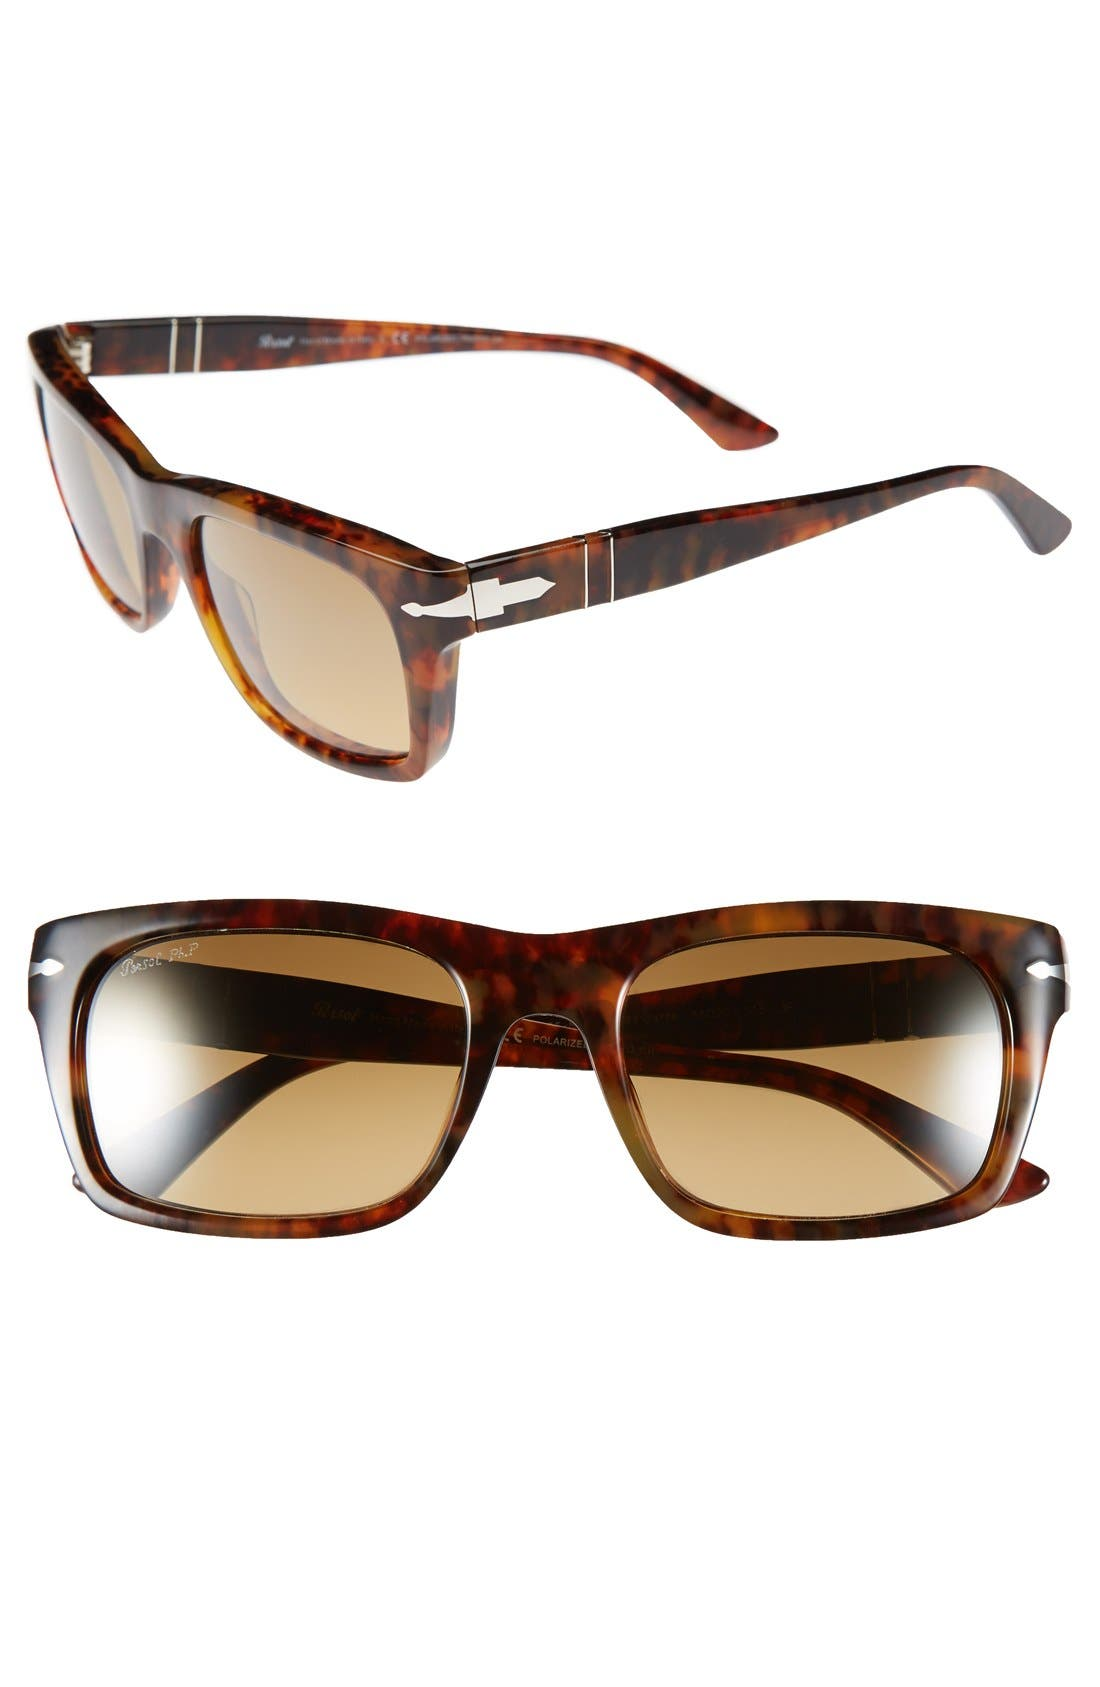 Main Image - Persol 55mm Photochromatic Sunglasses